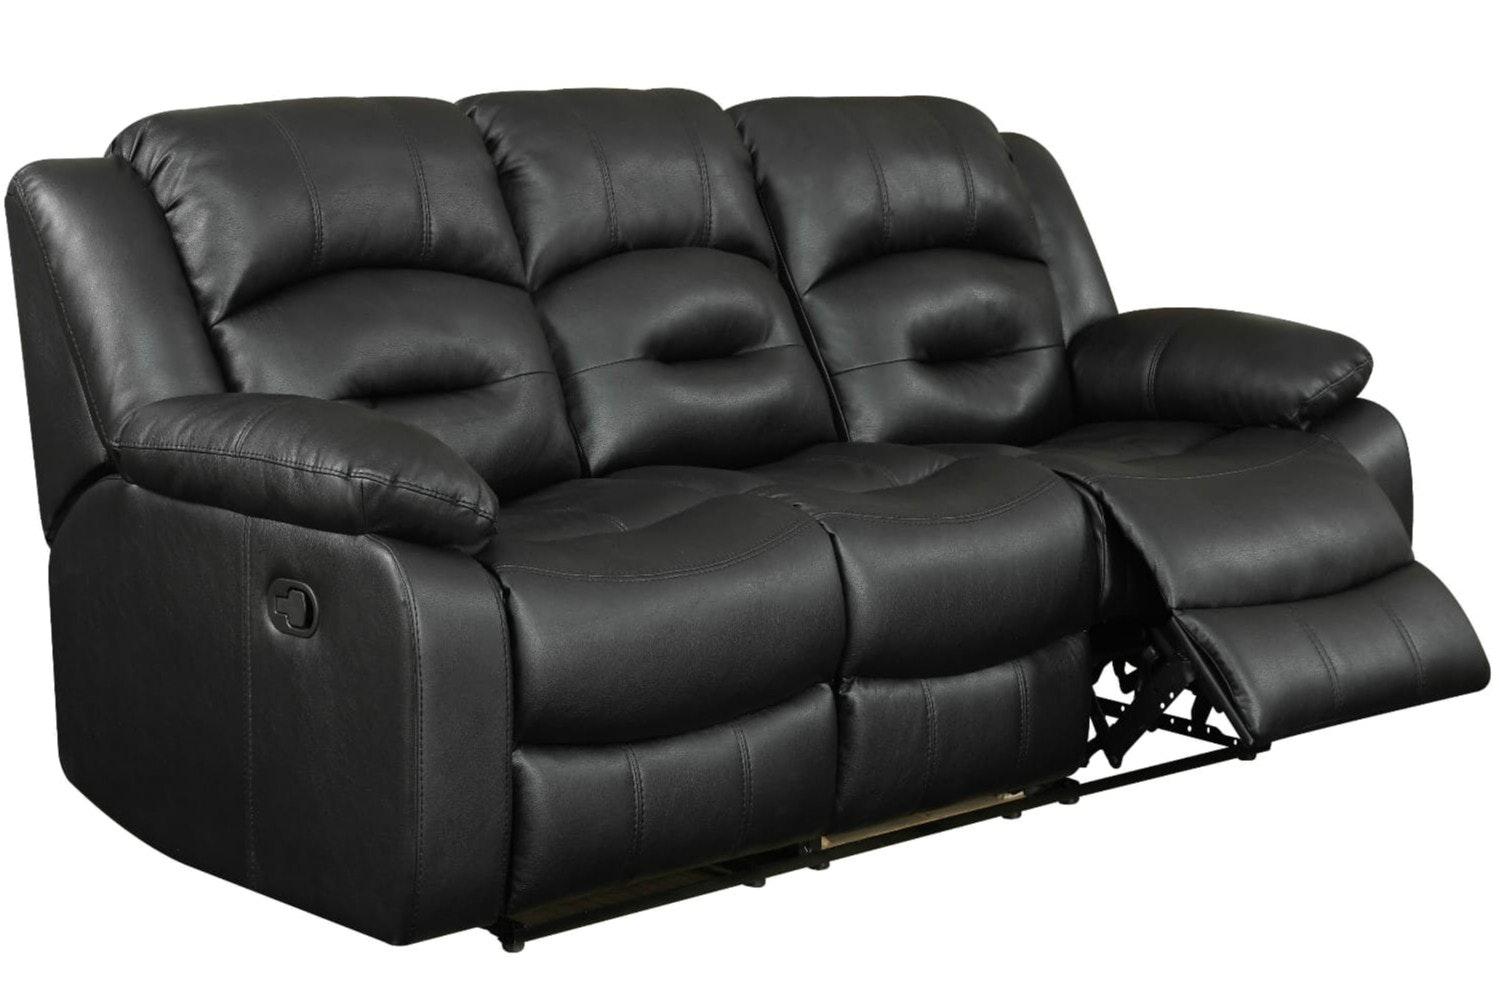 Hunter 3 Seater Recliner Sofa | Black